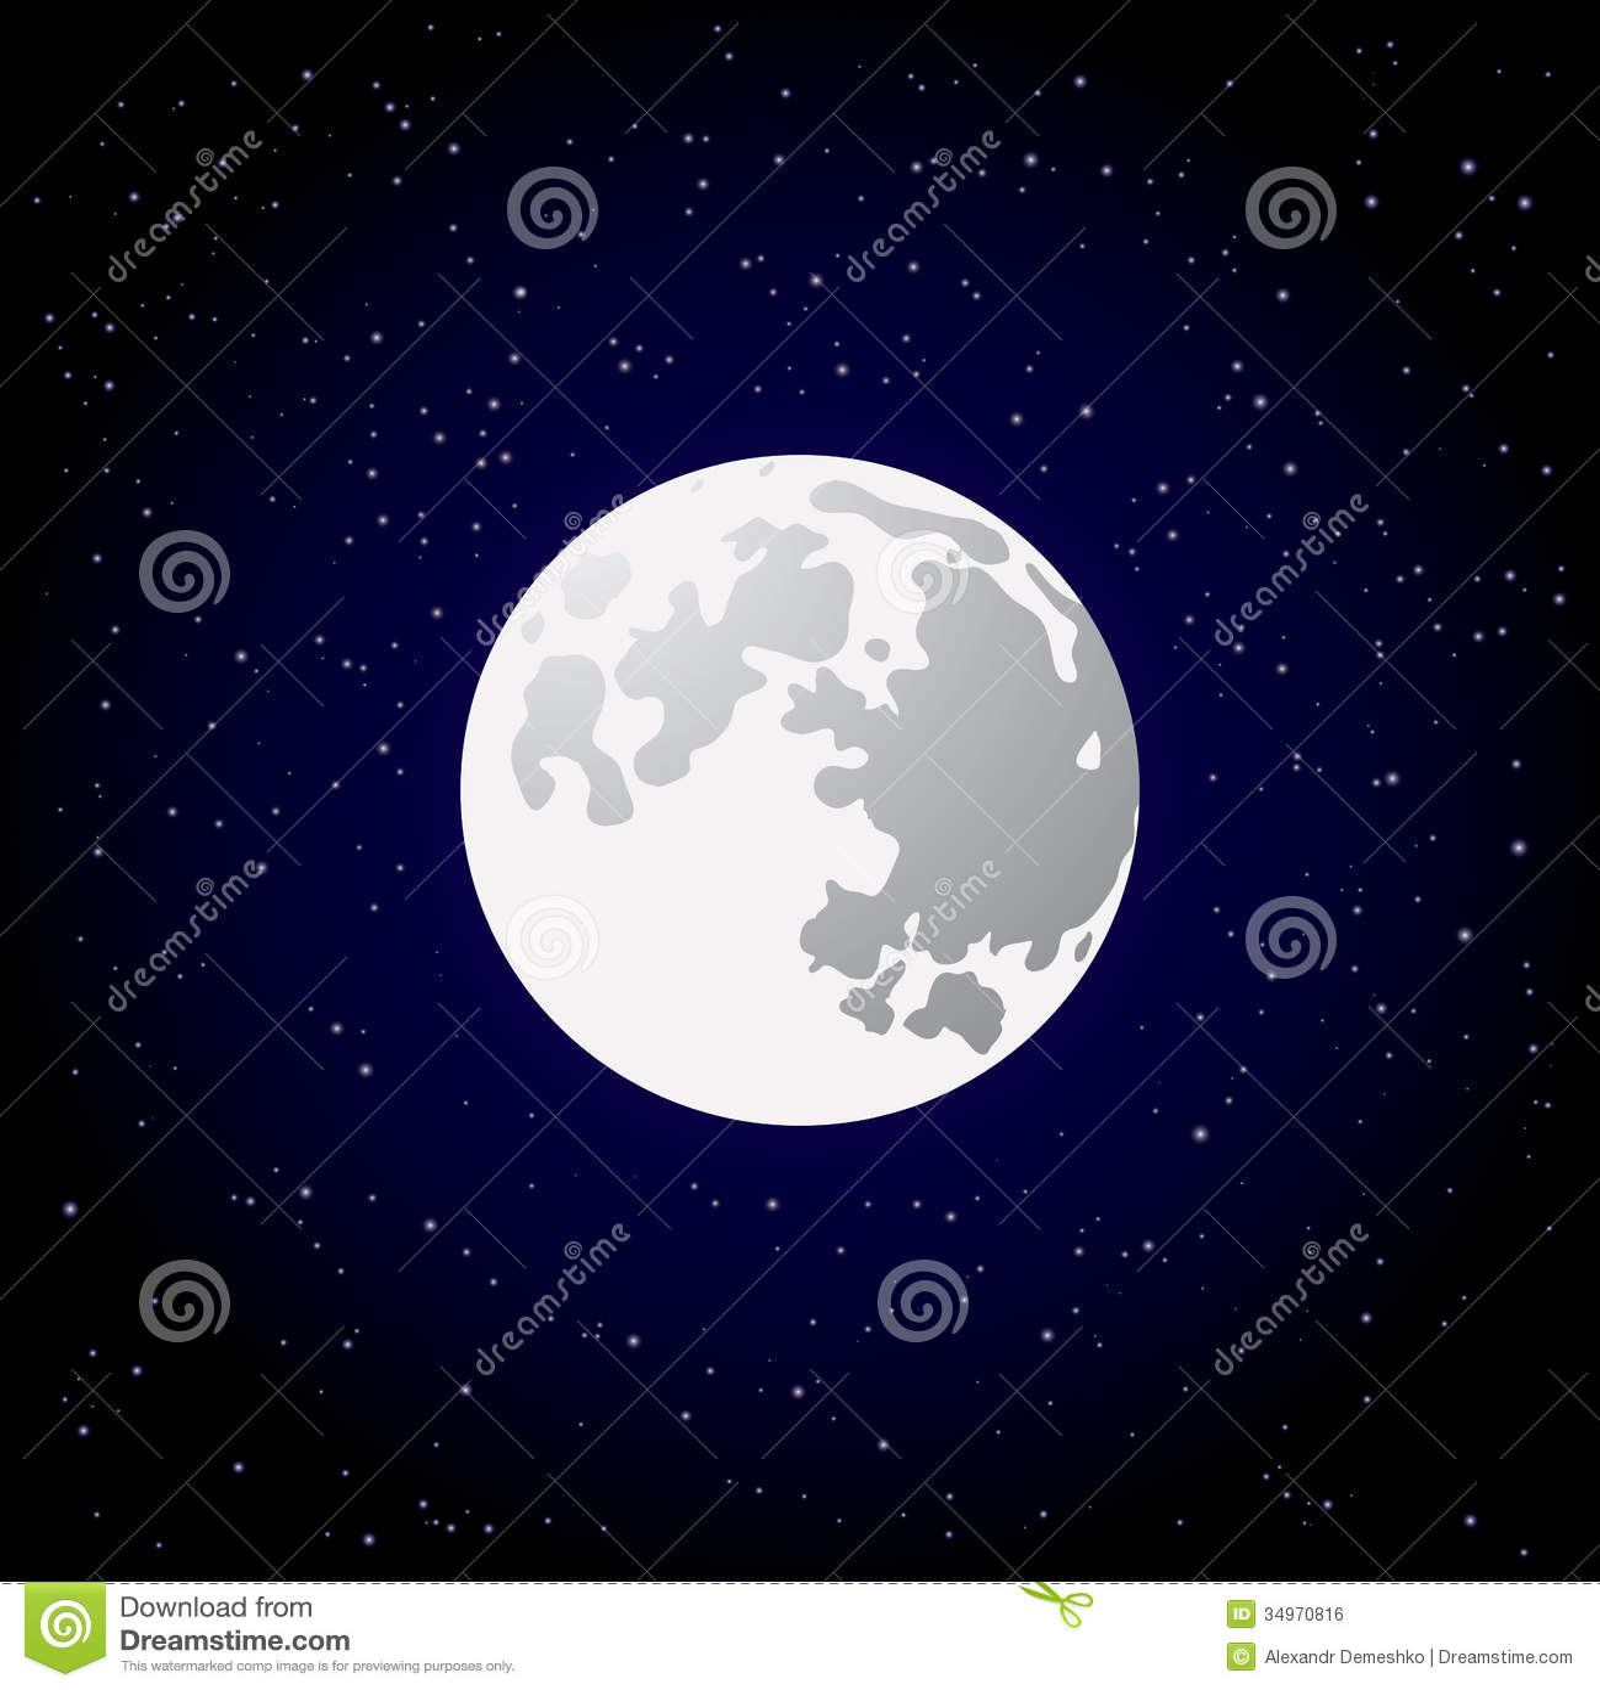 Cute Tribal Print Wallpaper Full Moon And Shining Stars On Dark Blue Sky Stock Vector